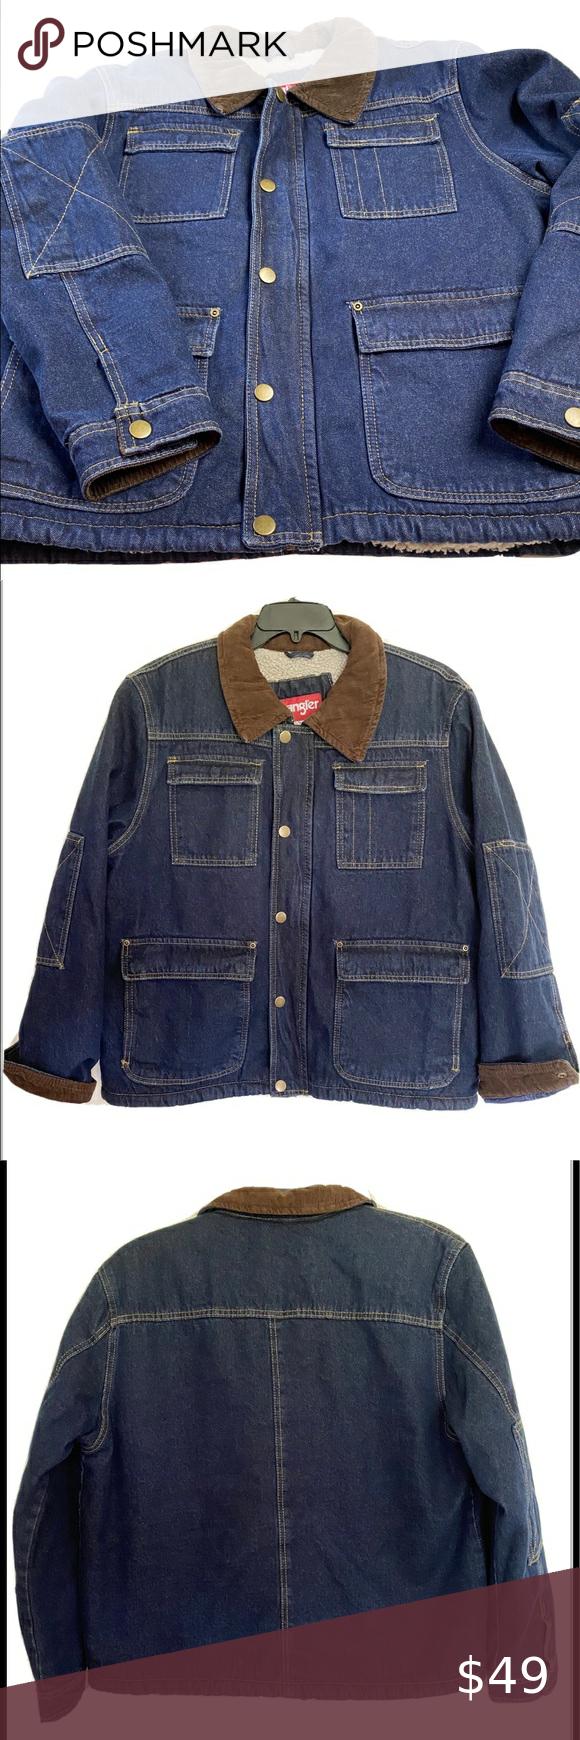 Wrangler Men S Sherpa Denim Jean Jacket Coat Sz L Sherpa Lined Denim Jacket Lined Denim Jacket Denim Jean Jacket [ 1740 x 580 Pixel ]